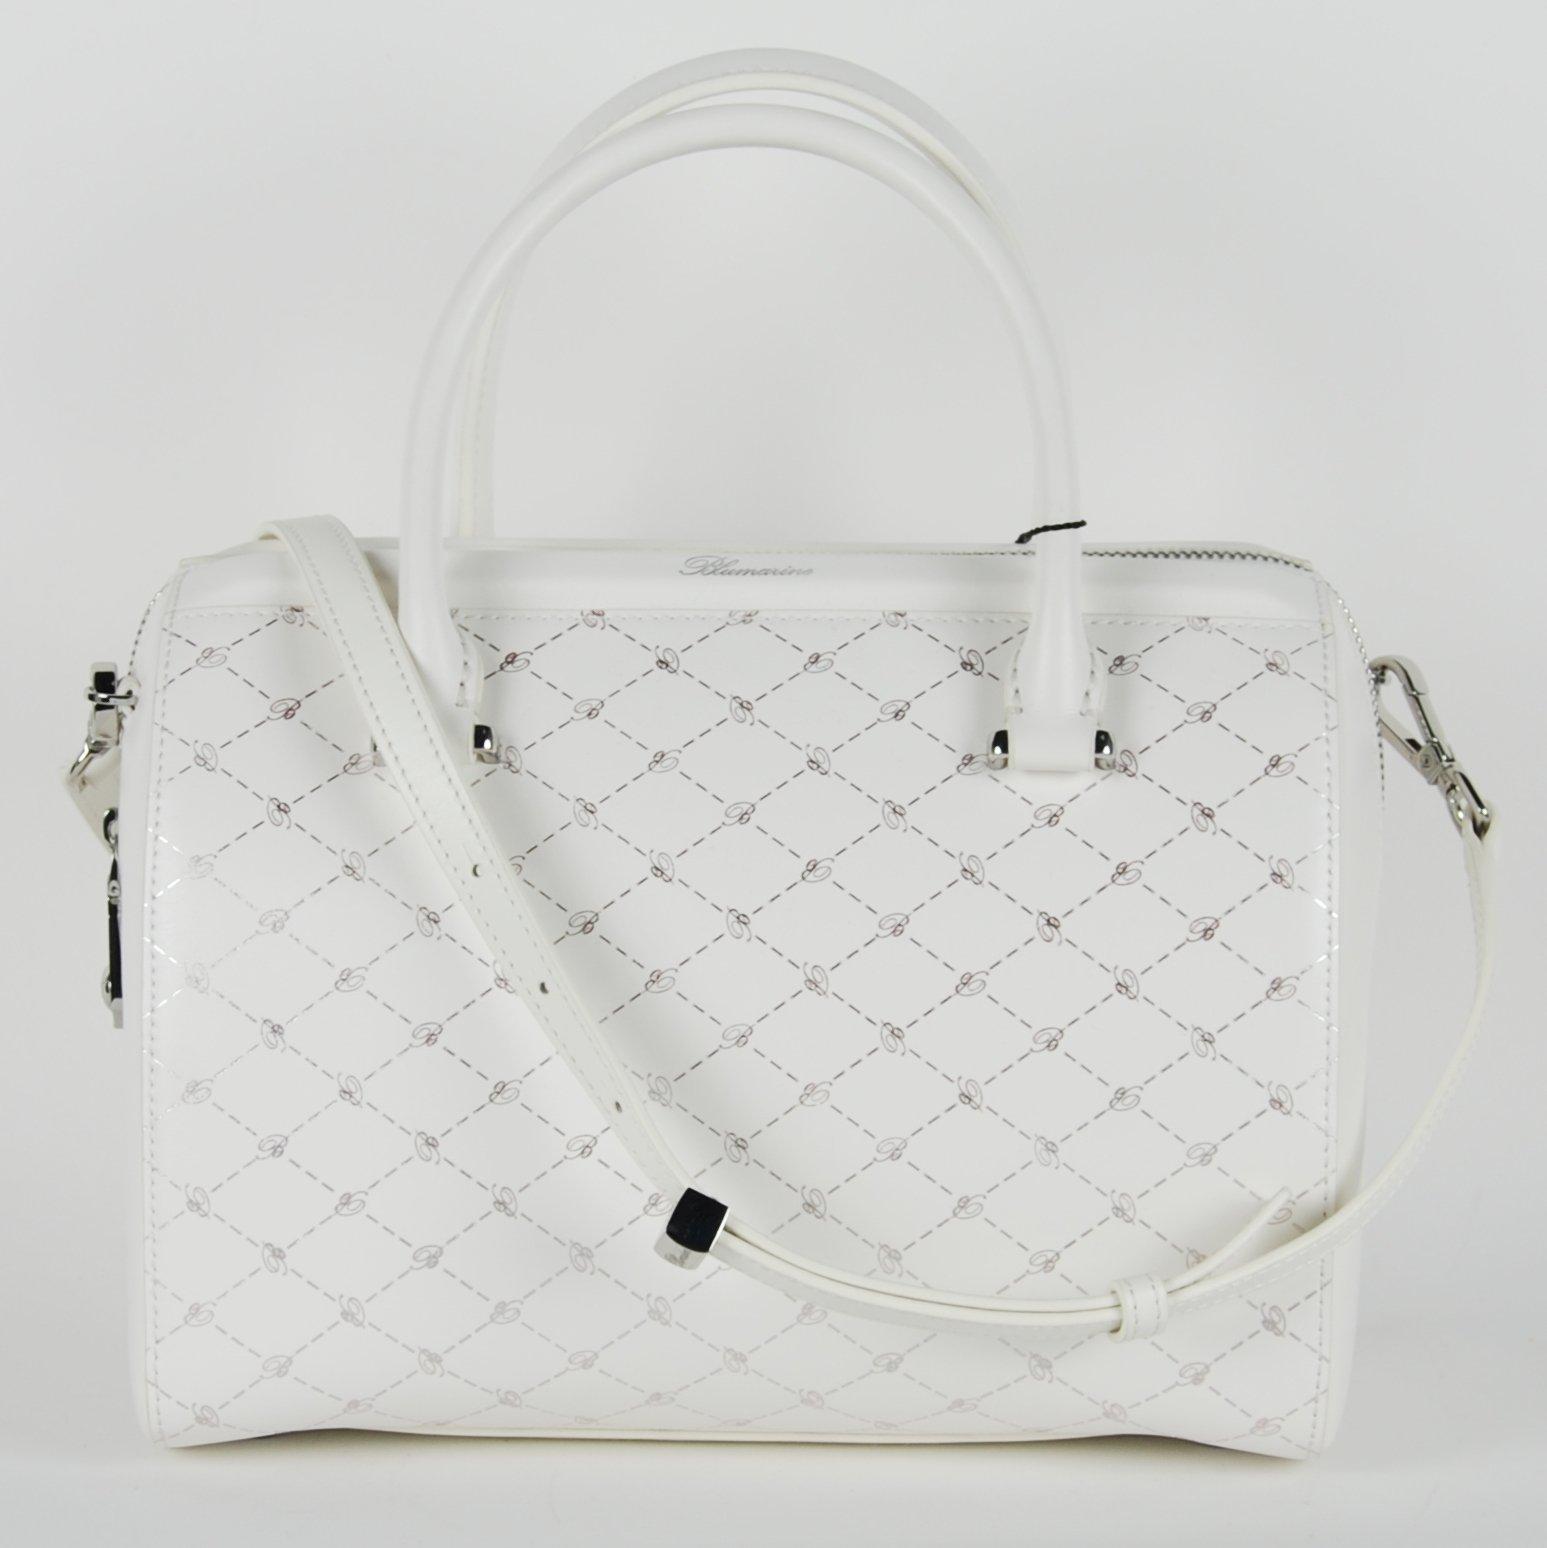 Blumarine Women's Bowling Bag White BL1421540